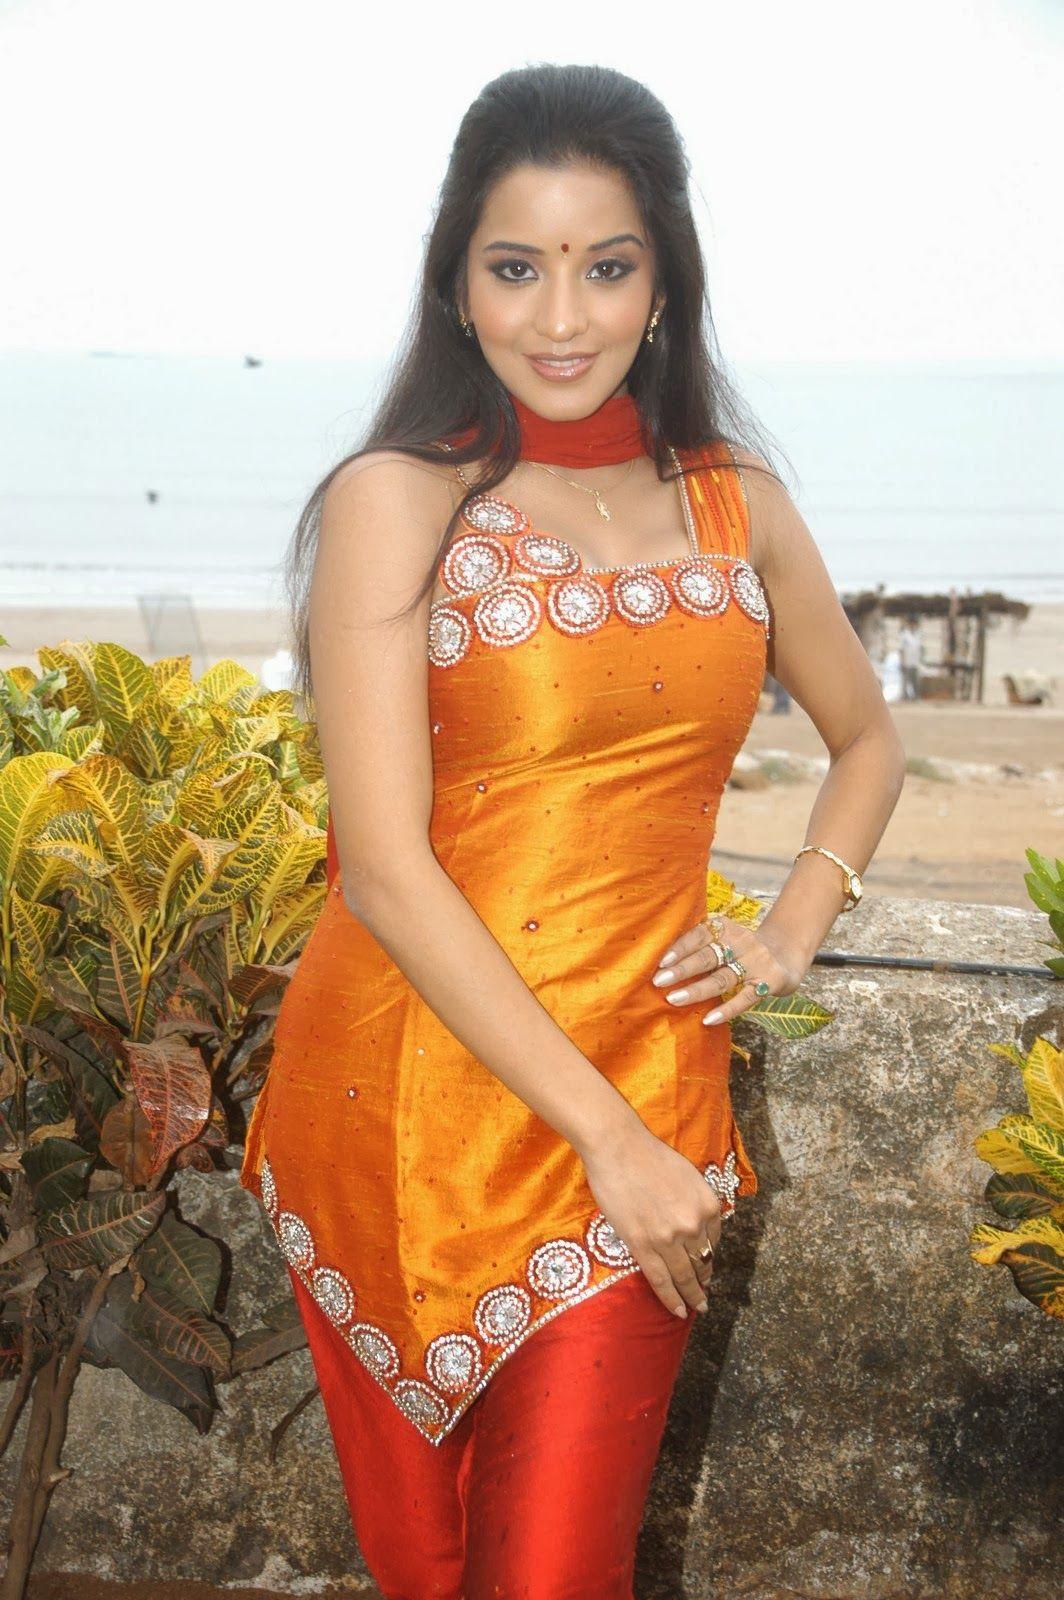 Bhojpuri Actress Monalisa Photos  Aa In 2019  Bhojpuri -3054